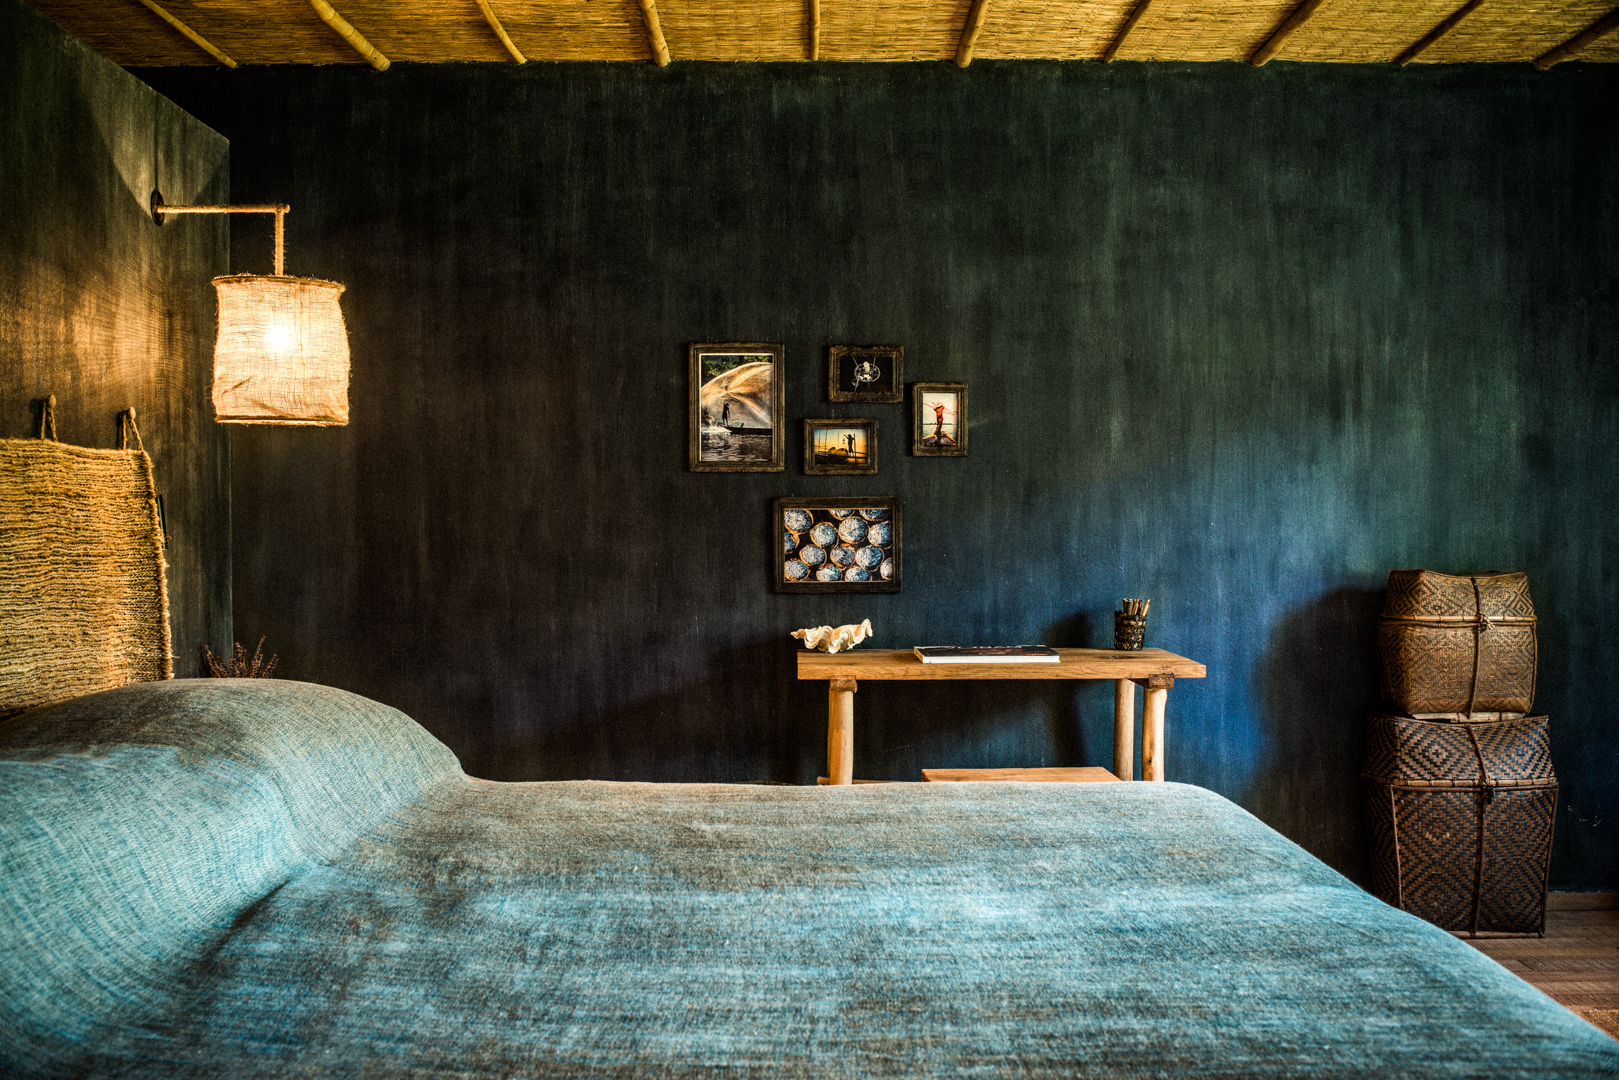 Zannier-Hotels-Bãi-San-Hô-Paddy-Field-Villa-5-©-Frederik-Wissink-for-Zannier-Hotels